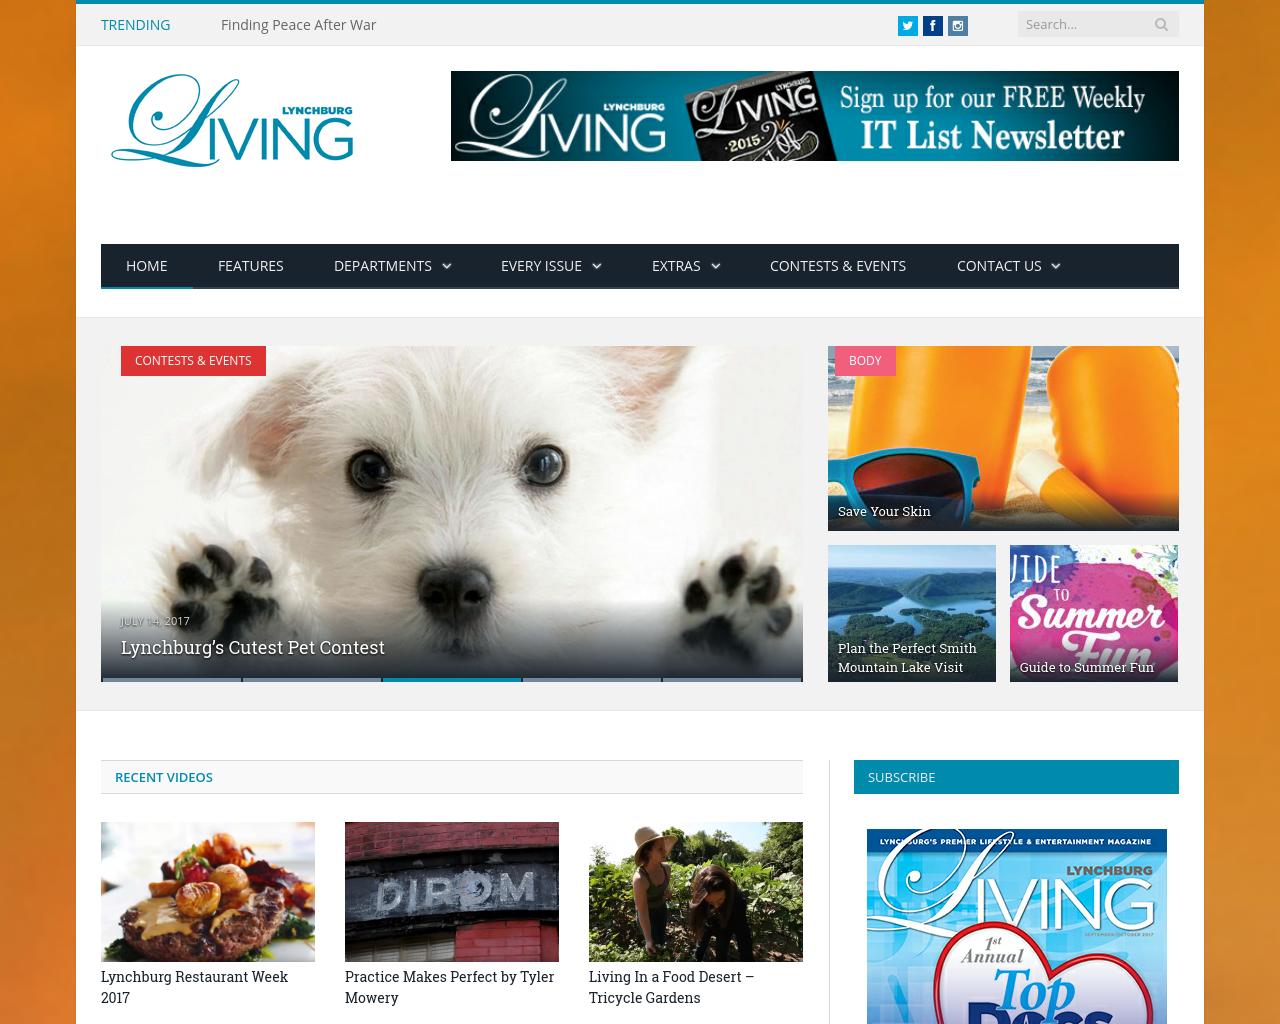 Lynchburg-Living-Advertising-Reviews-Pricing